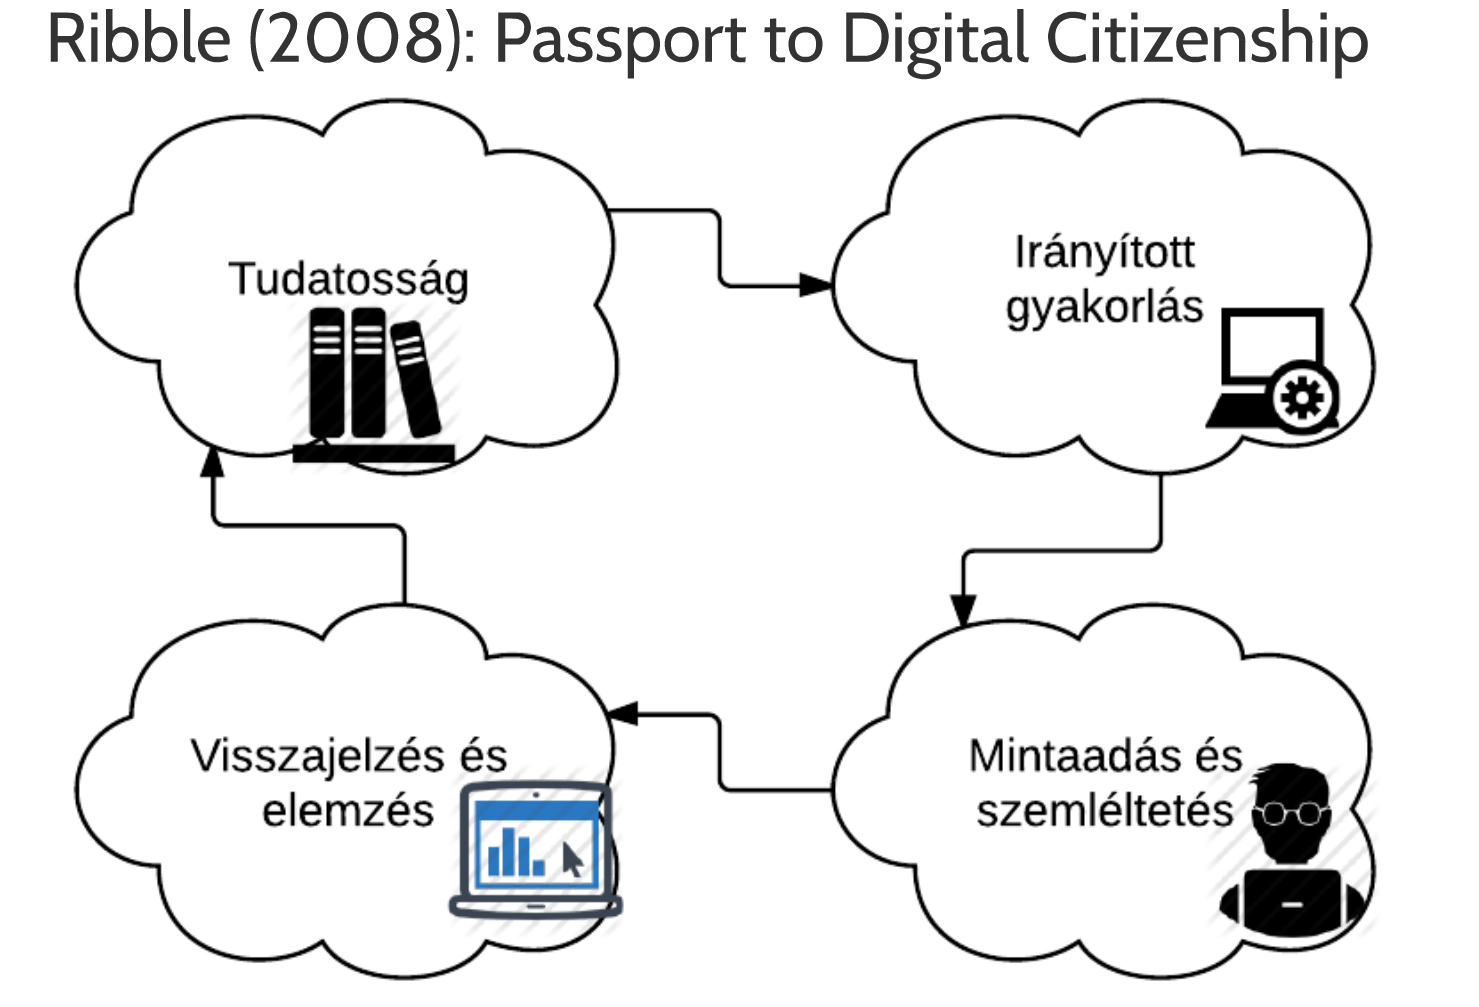 ribble_passport_2008.png